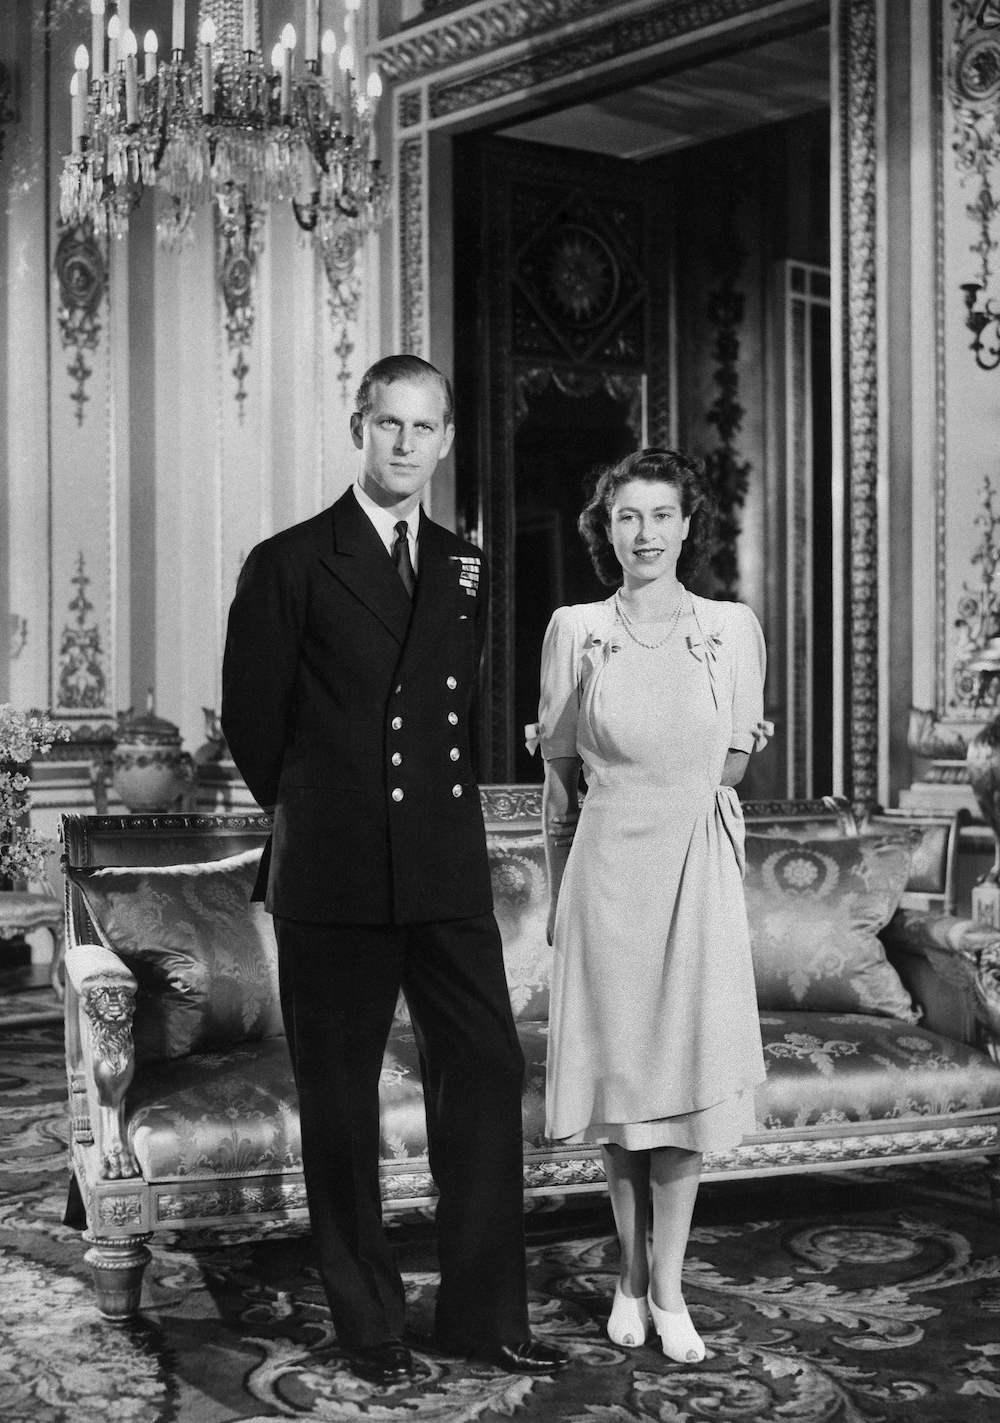 Princess Elizabeth and Philip Mountbatten, later Queen Elizabeth II and Prince Philip